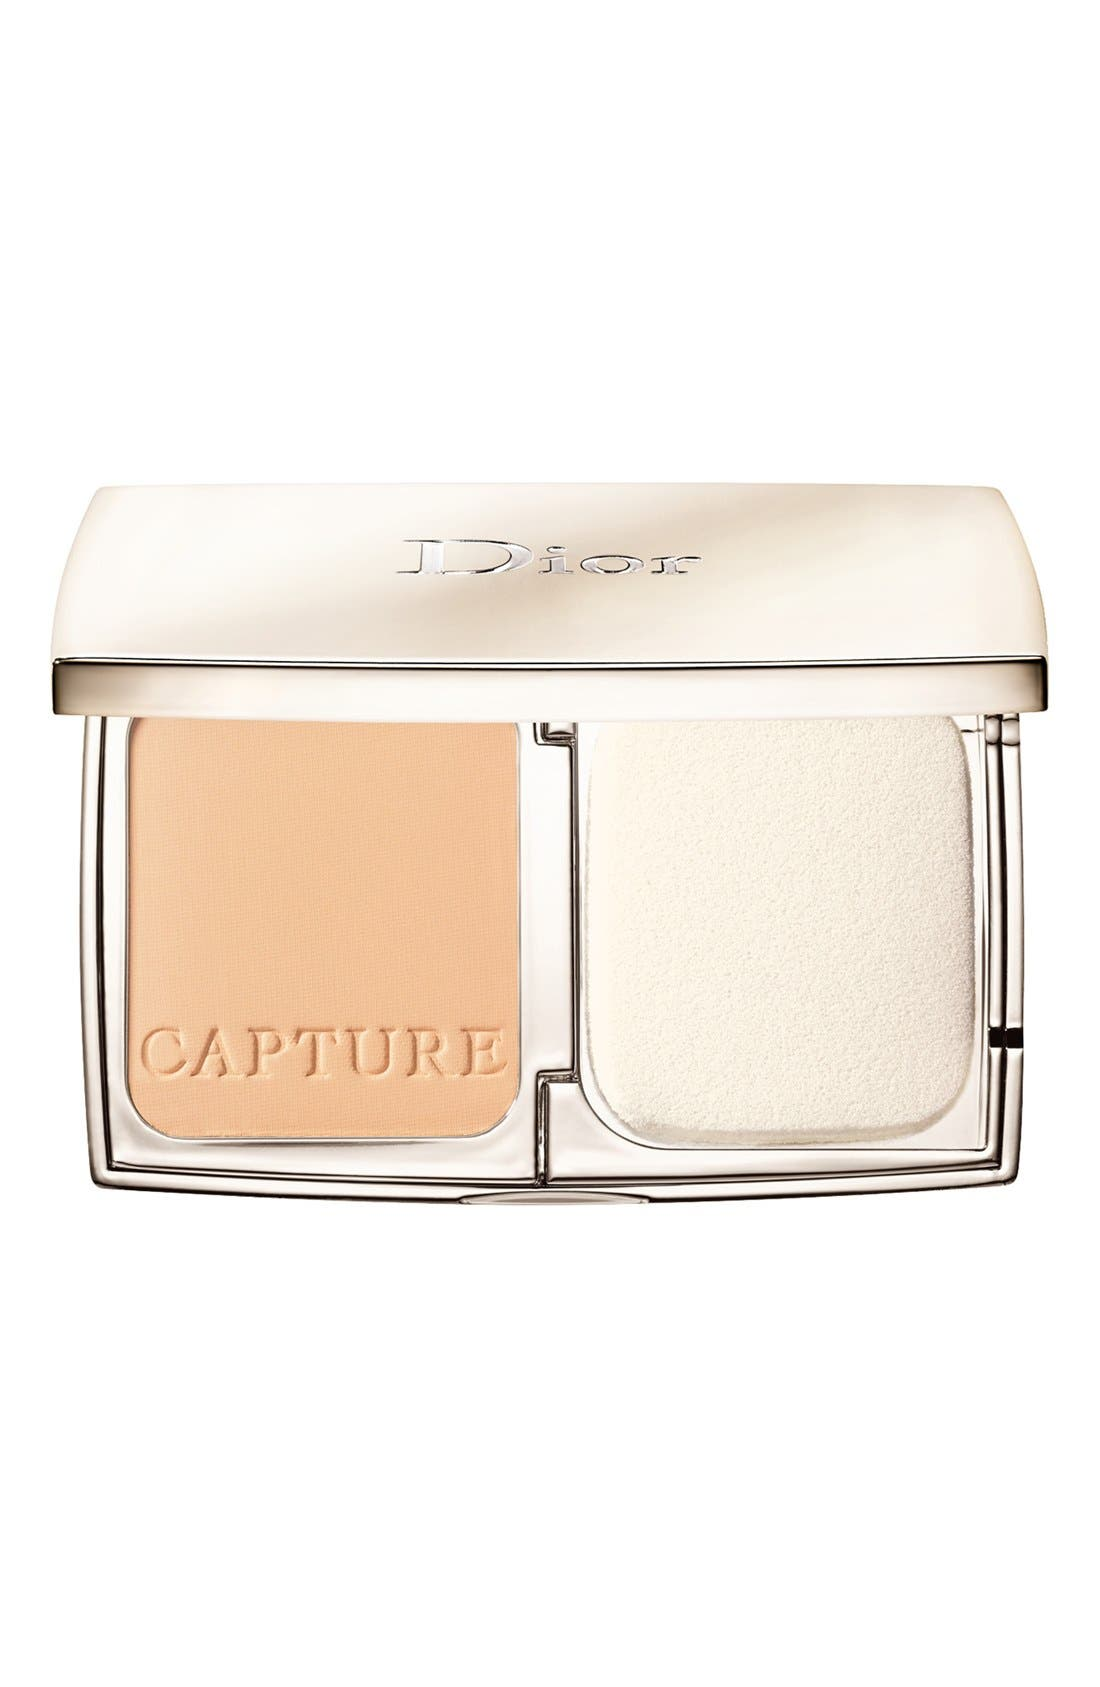 Dior Capture Totale Powder Foundation Compact - 20 Light Beige